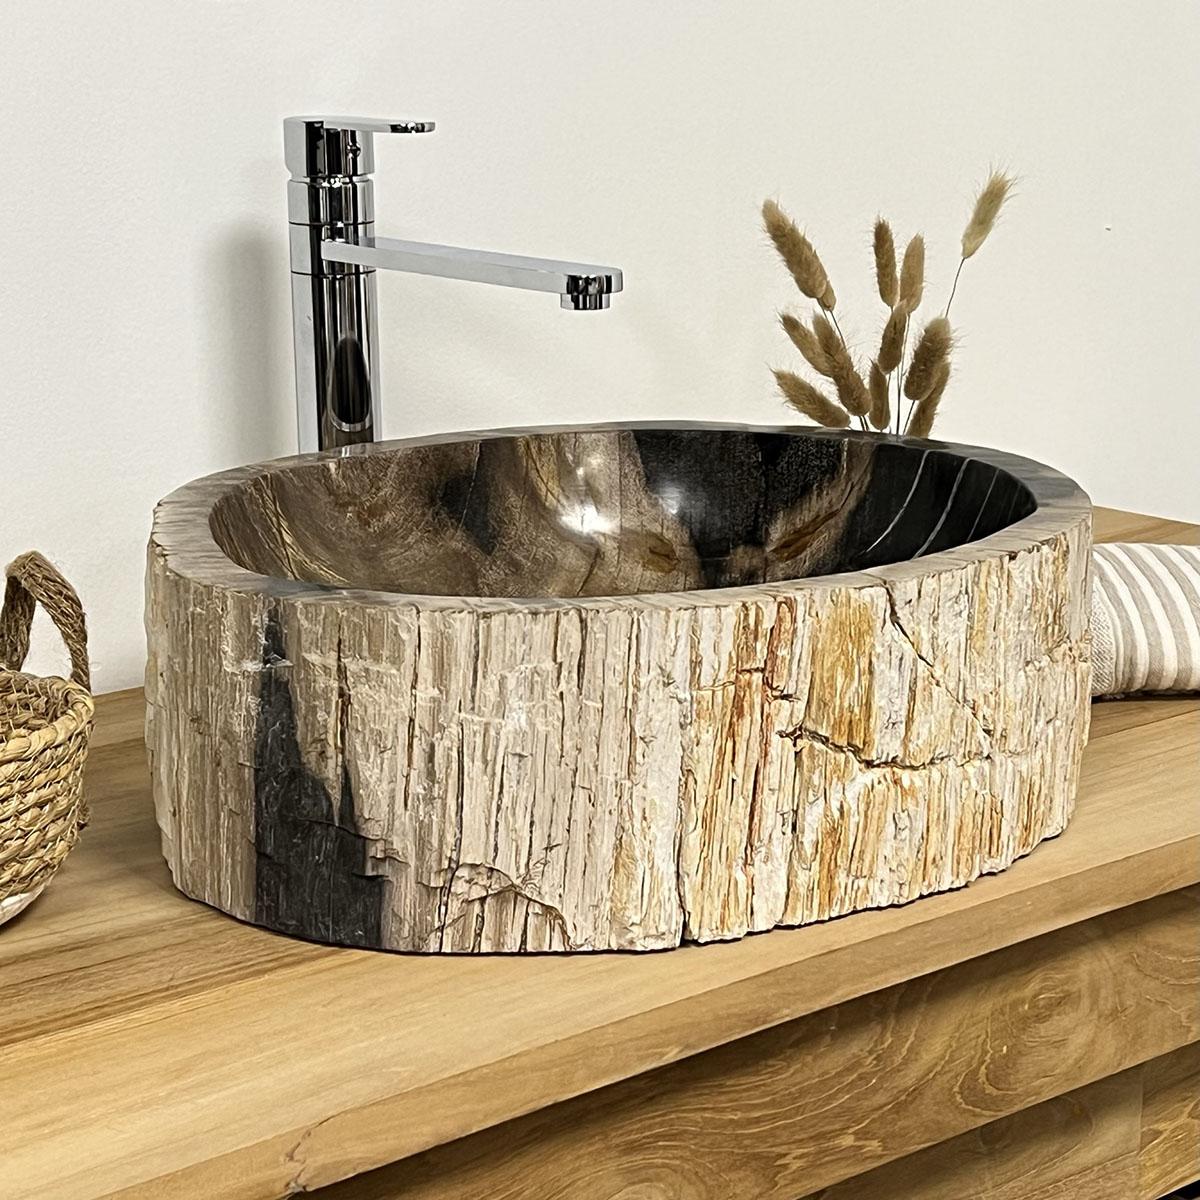 Lavabo lavabo encimera madera petrificada fosilizada - Habitacion de madera ...